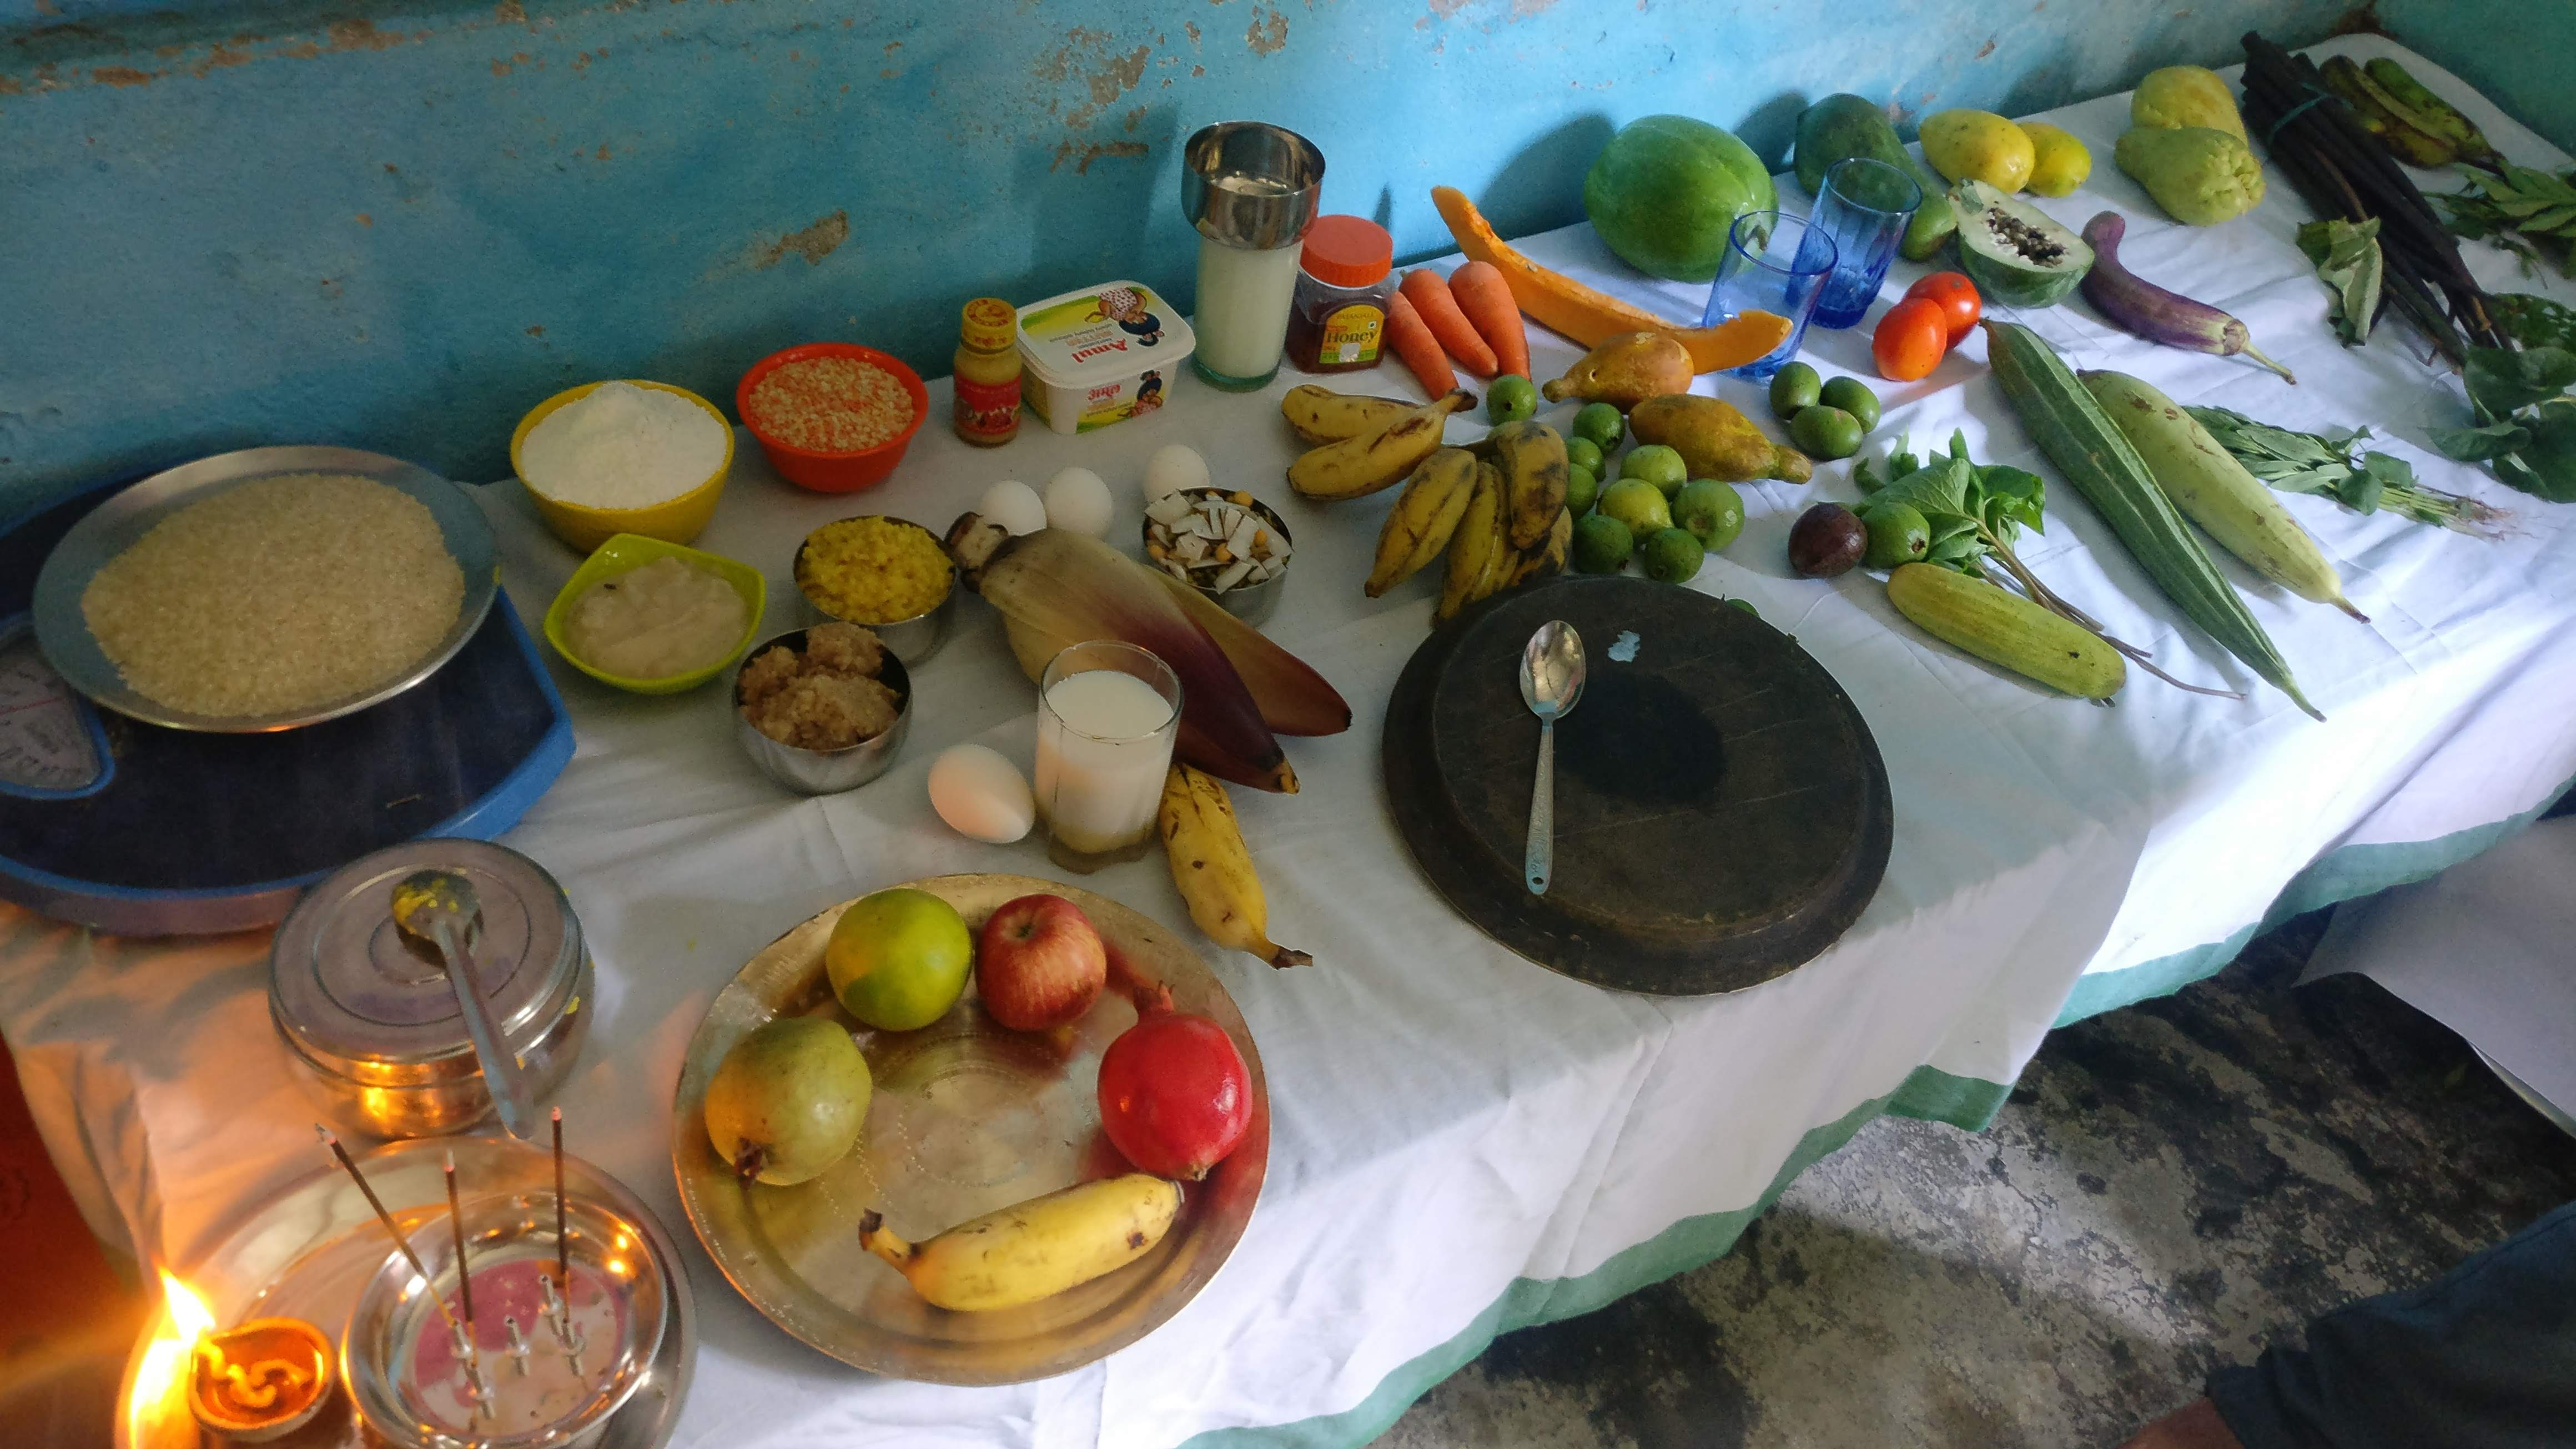 ANSH Stall At The Health Mela During National Nutrition Week At Bisheshwarganj Block Of Bahraich District